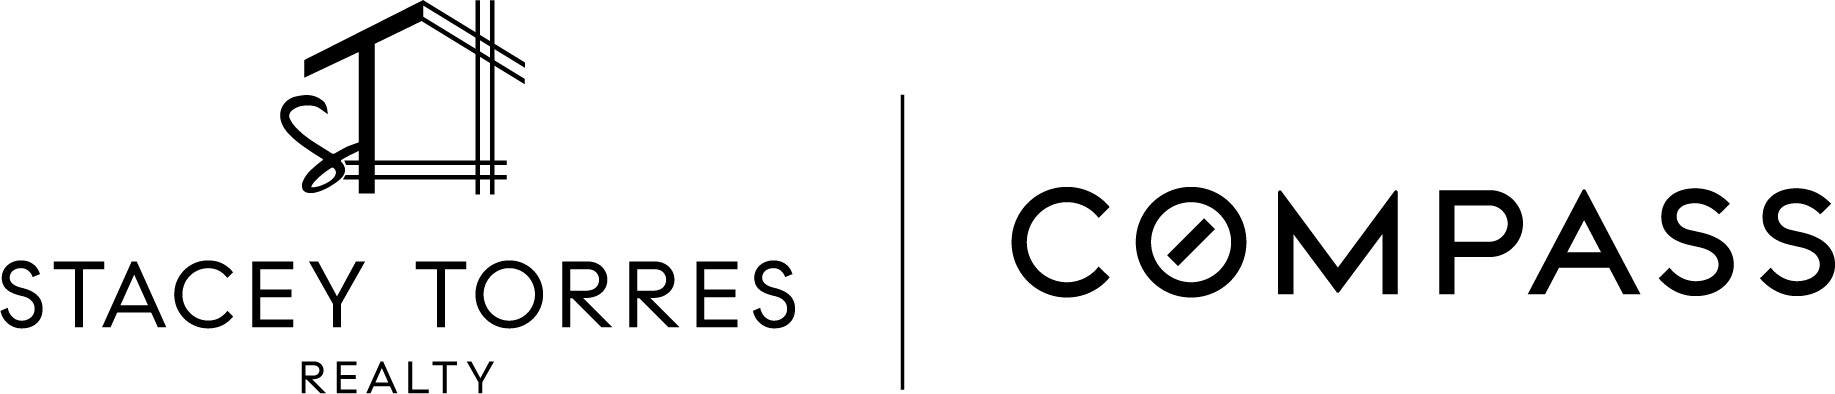 Stacey Torres Compass Logo Black